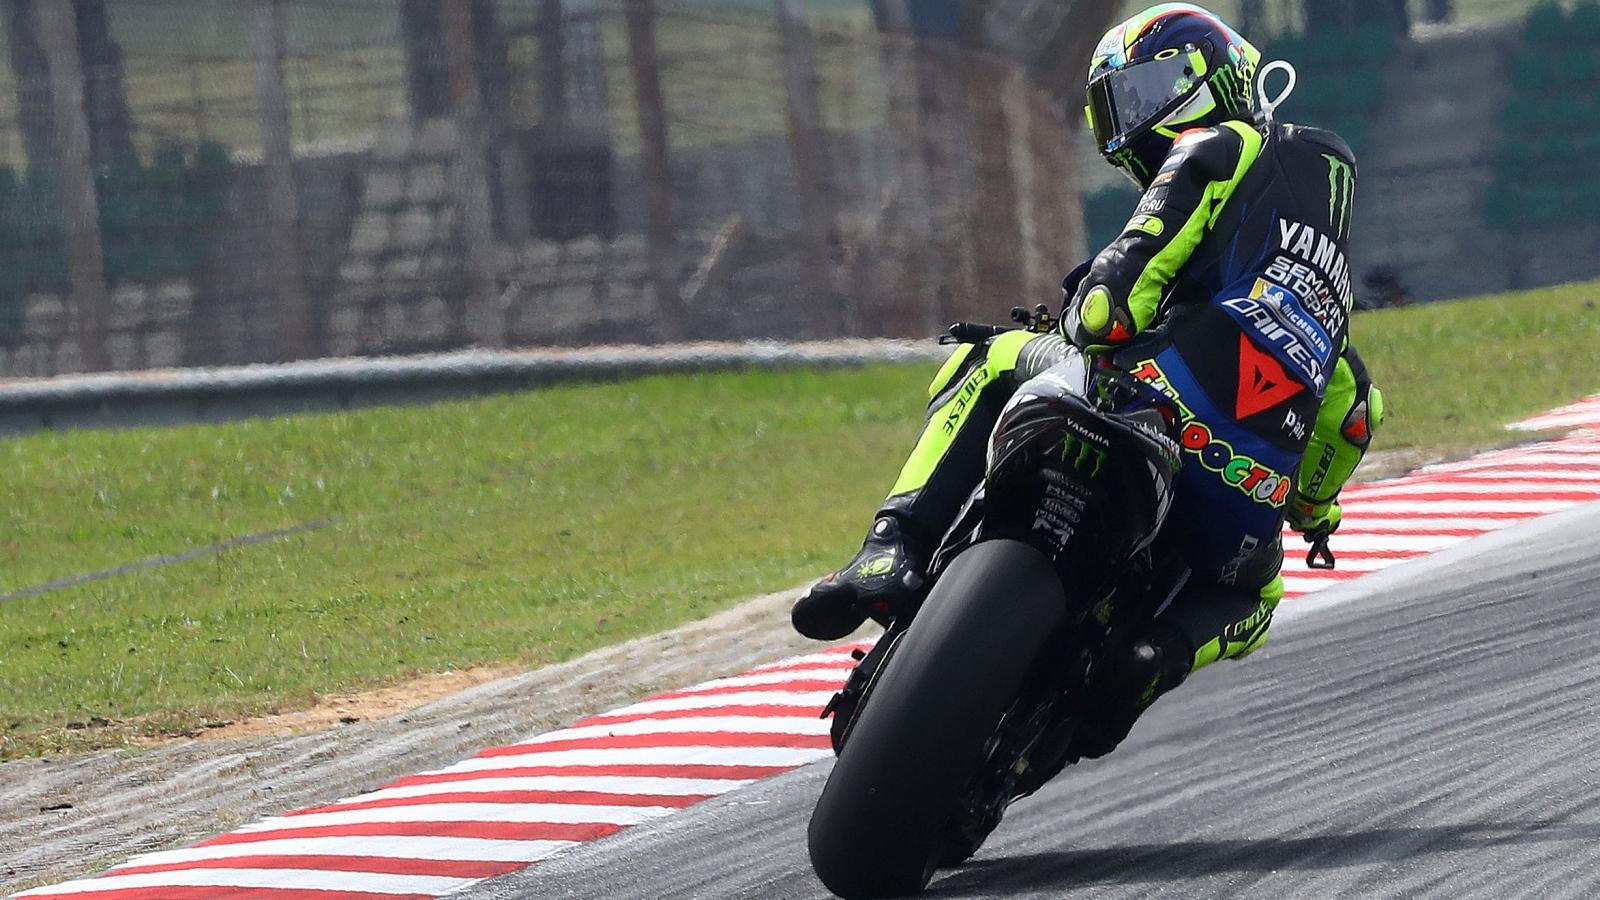 25 años Valentino Rossi: 2020 – MotoGP – Yamaha YZR-M1 / Monster Energy Yamaha MotoGP